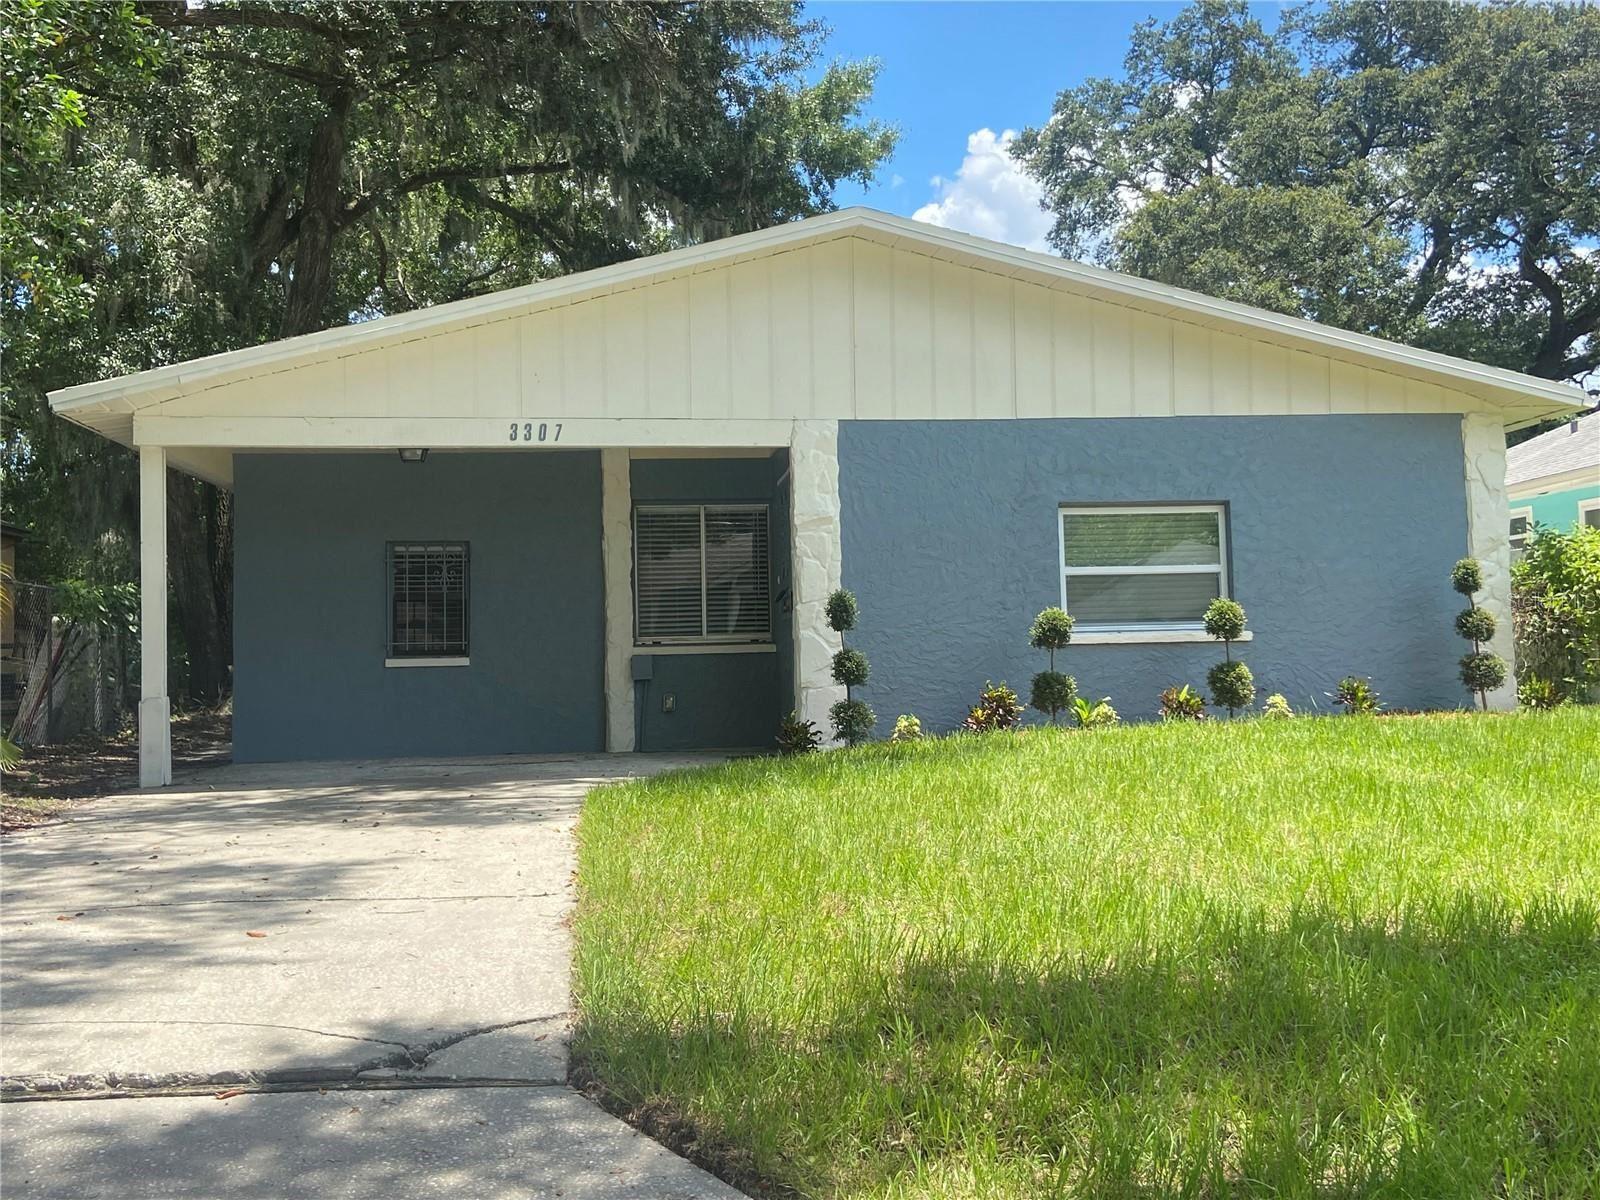 3307 N BAILEY STREET, Tampa, FL 33603 - MLS#: T3298321